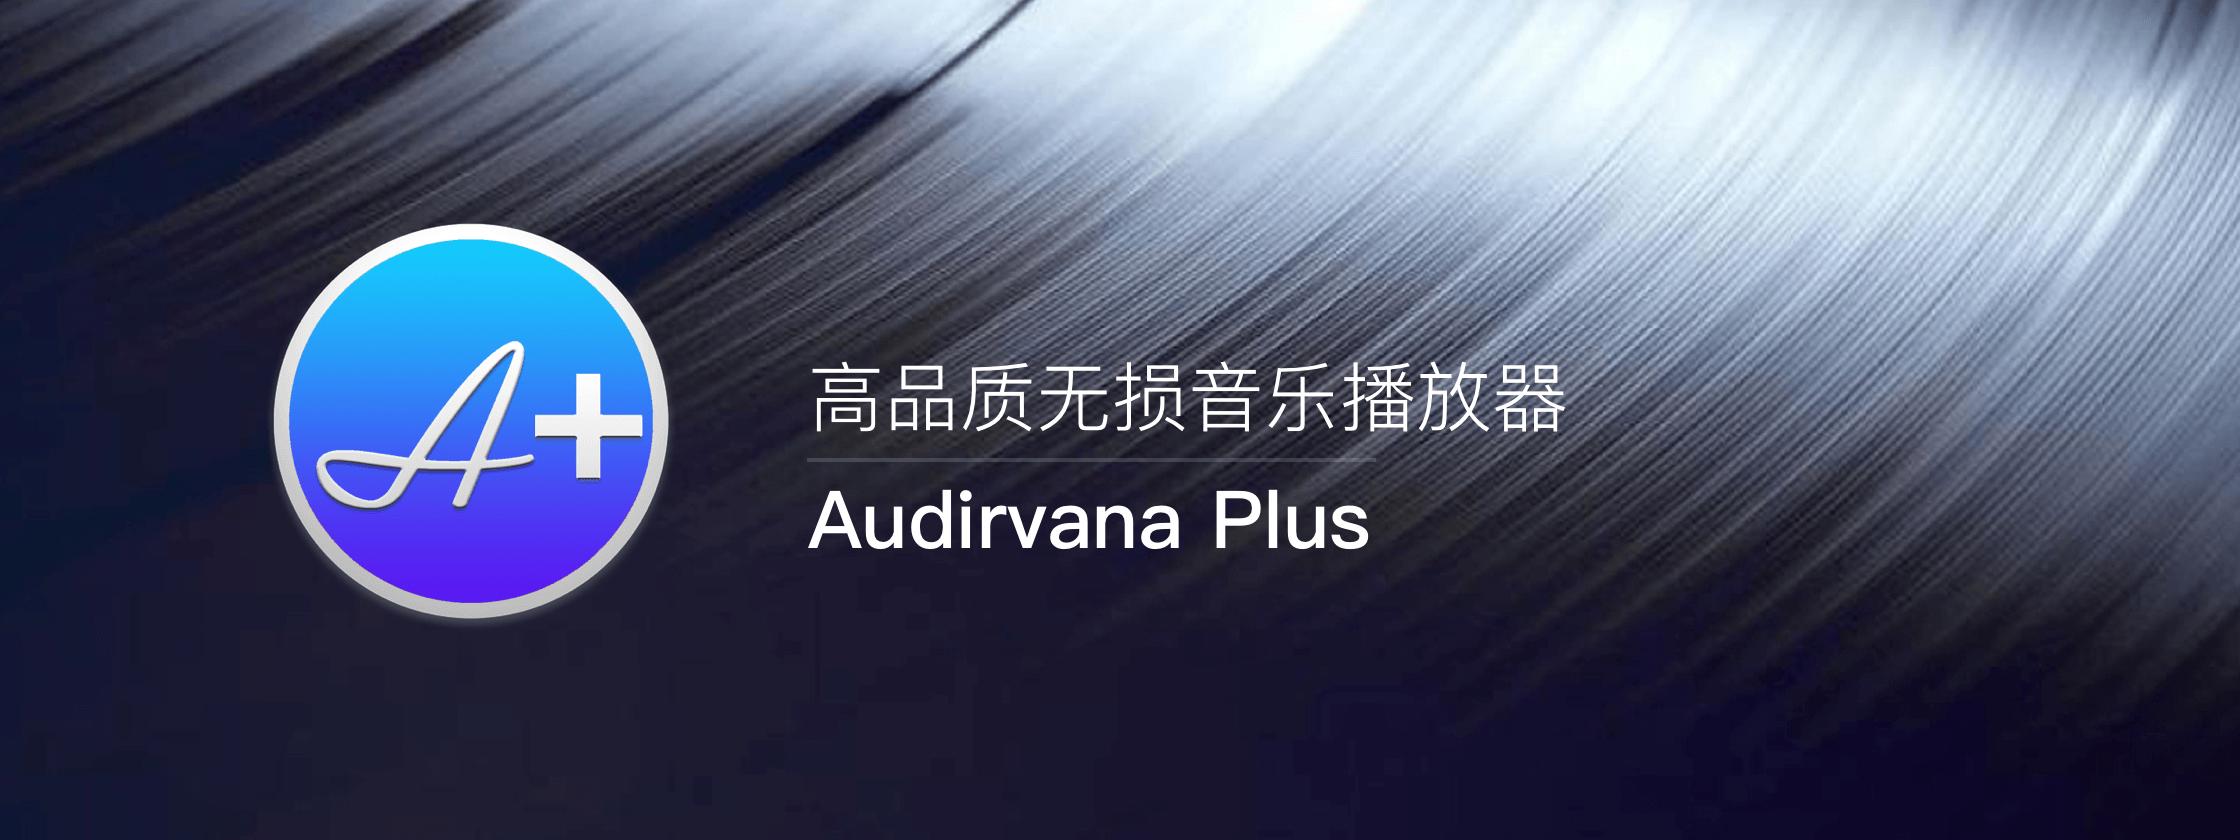 Audirvana – 高品质无损音乐播放器